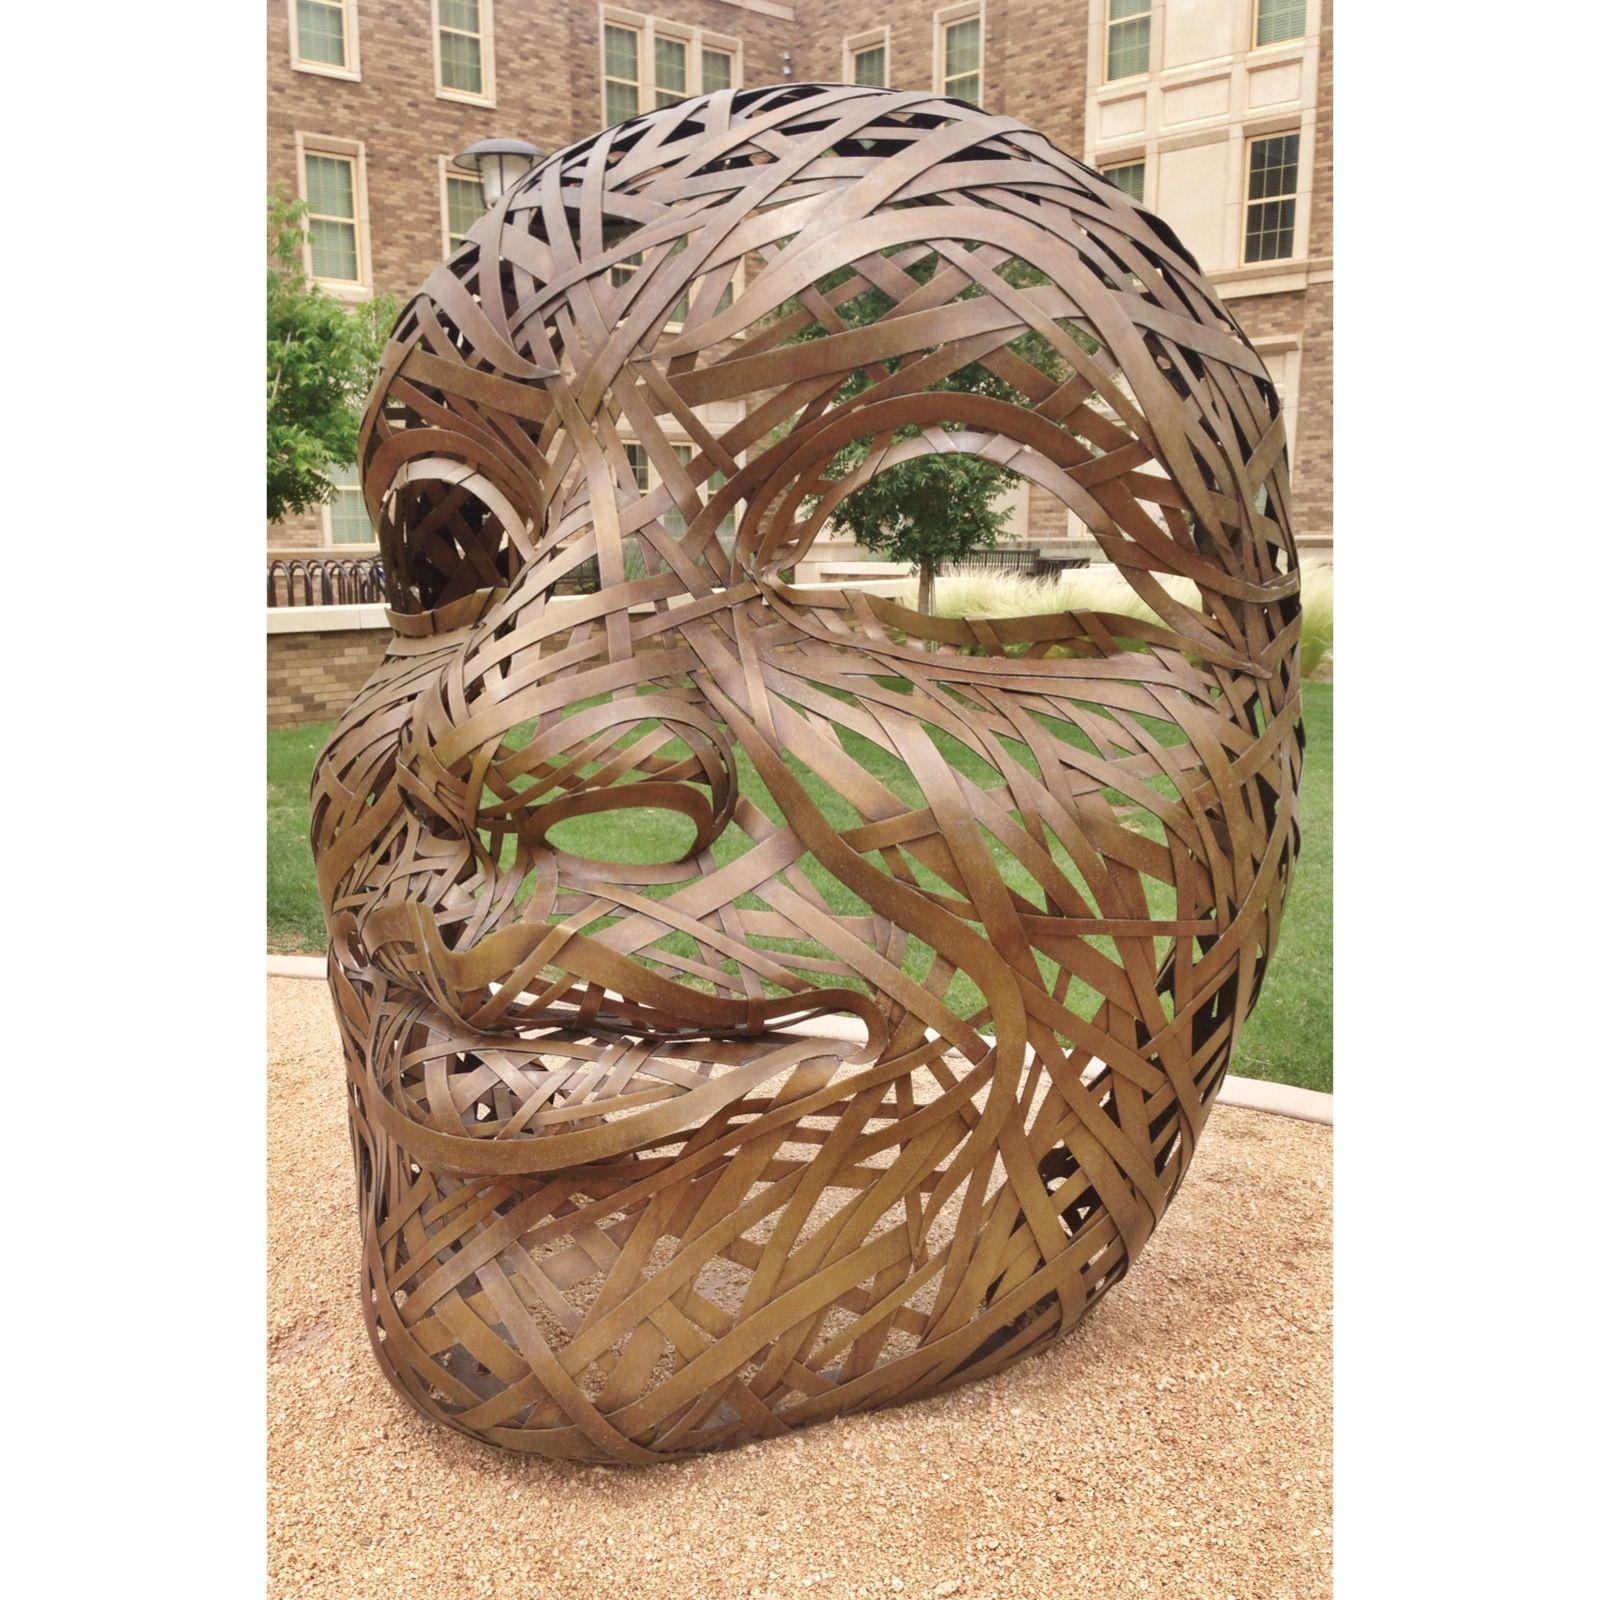 Four Faces sculptures at Talkington Hall on Texas Tech campus.  #TexasTech #TTAA #SupportTradition